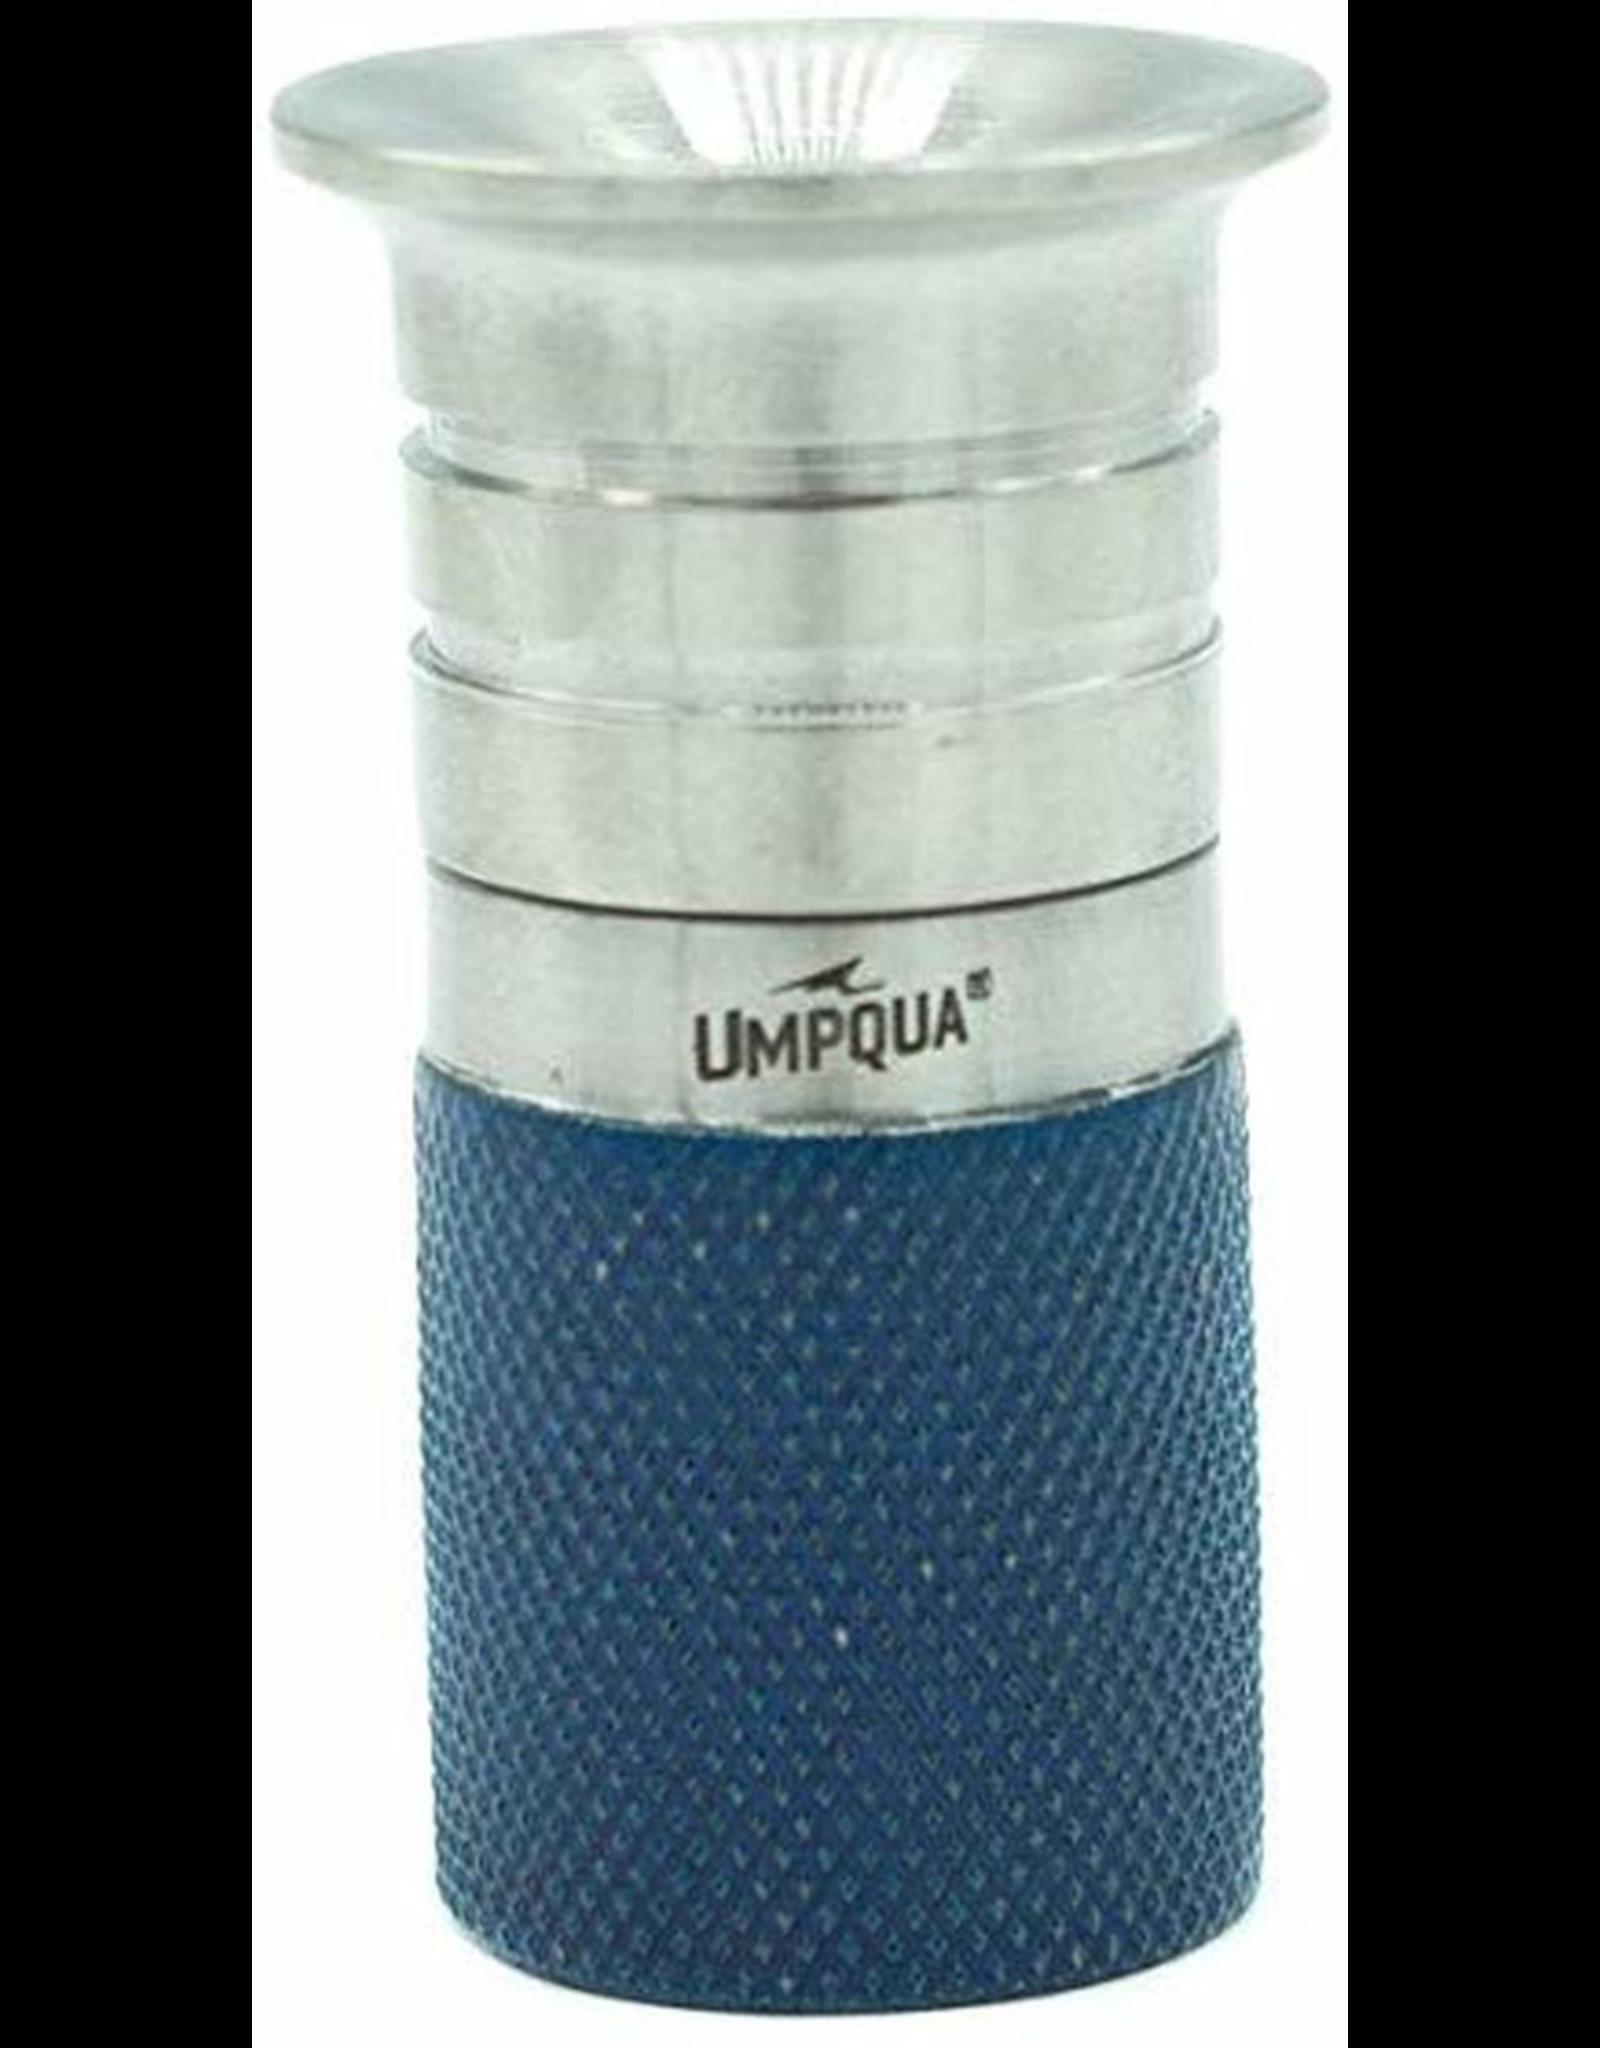 Umpqua Dream Stream Plus Hair Stacker Small